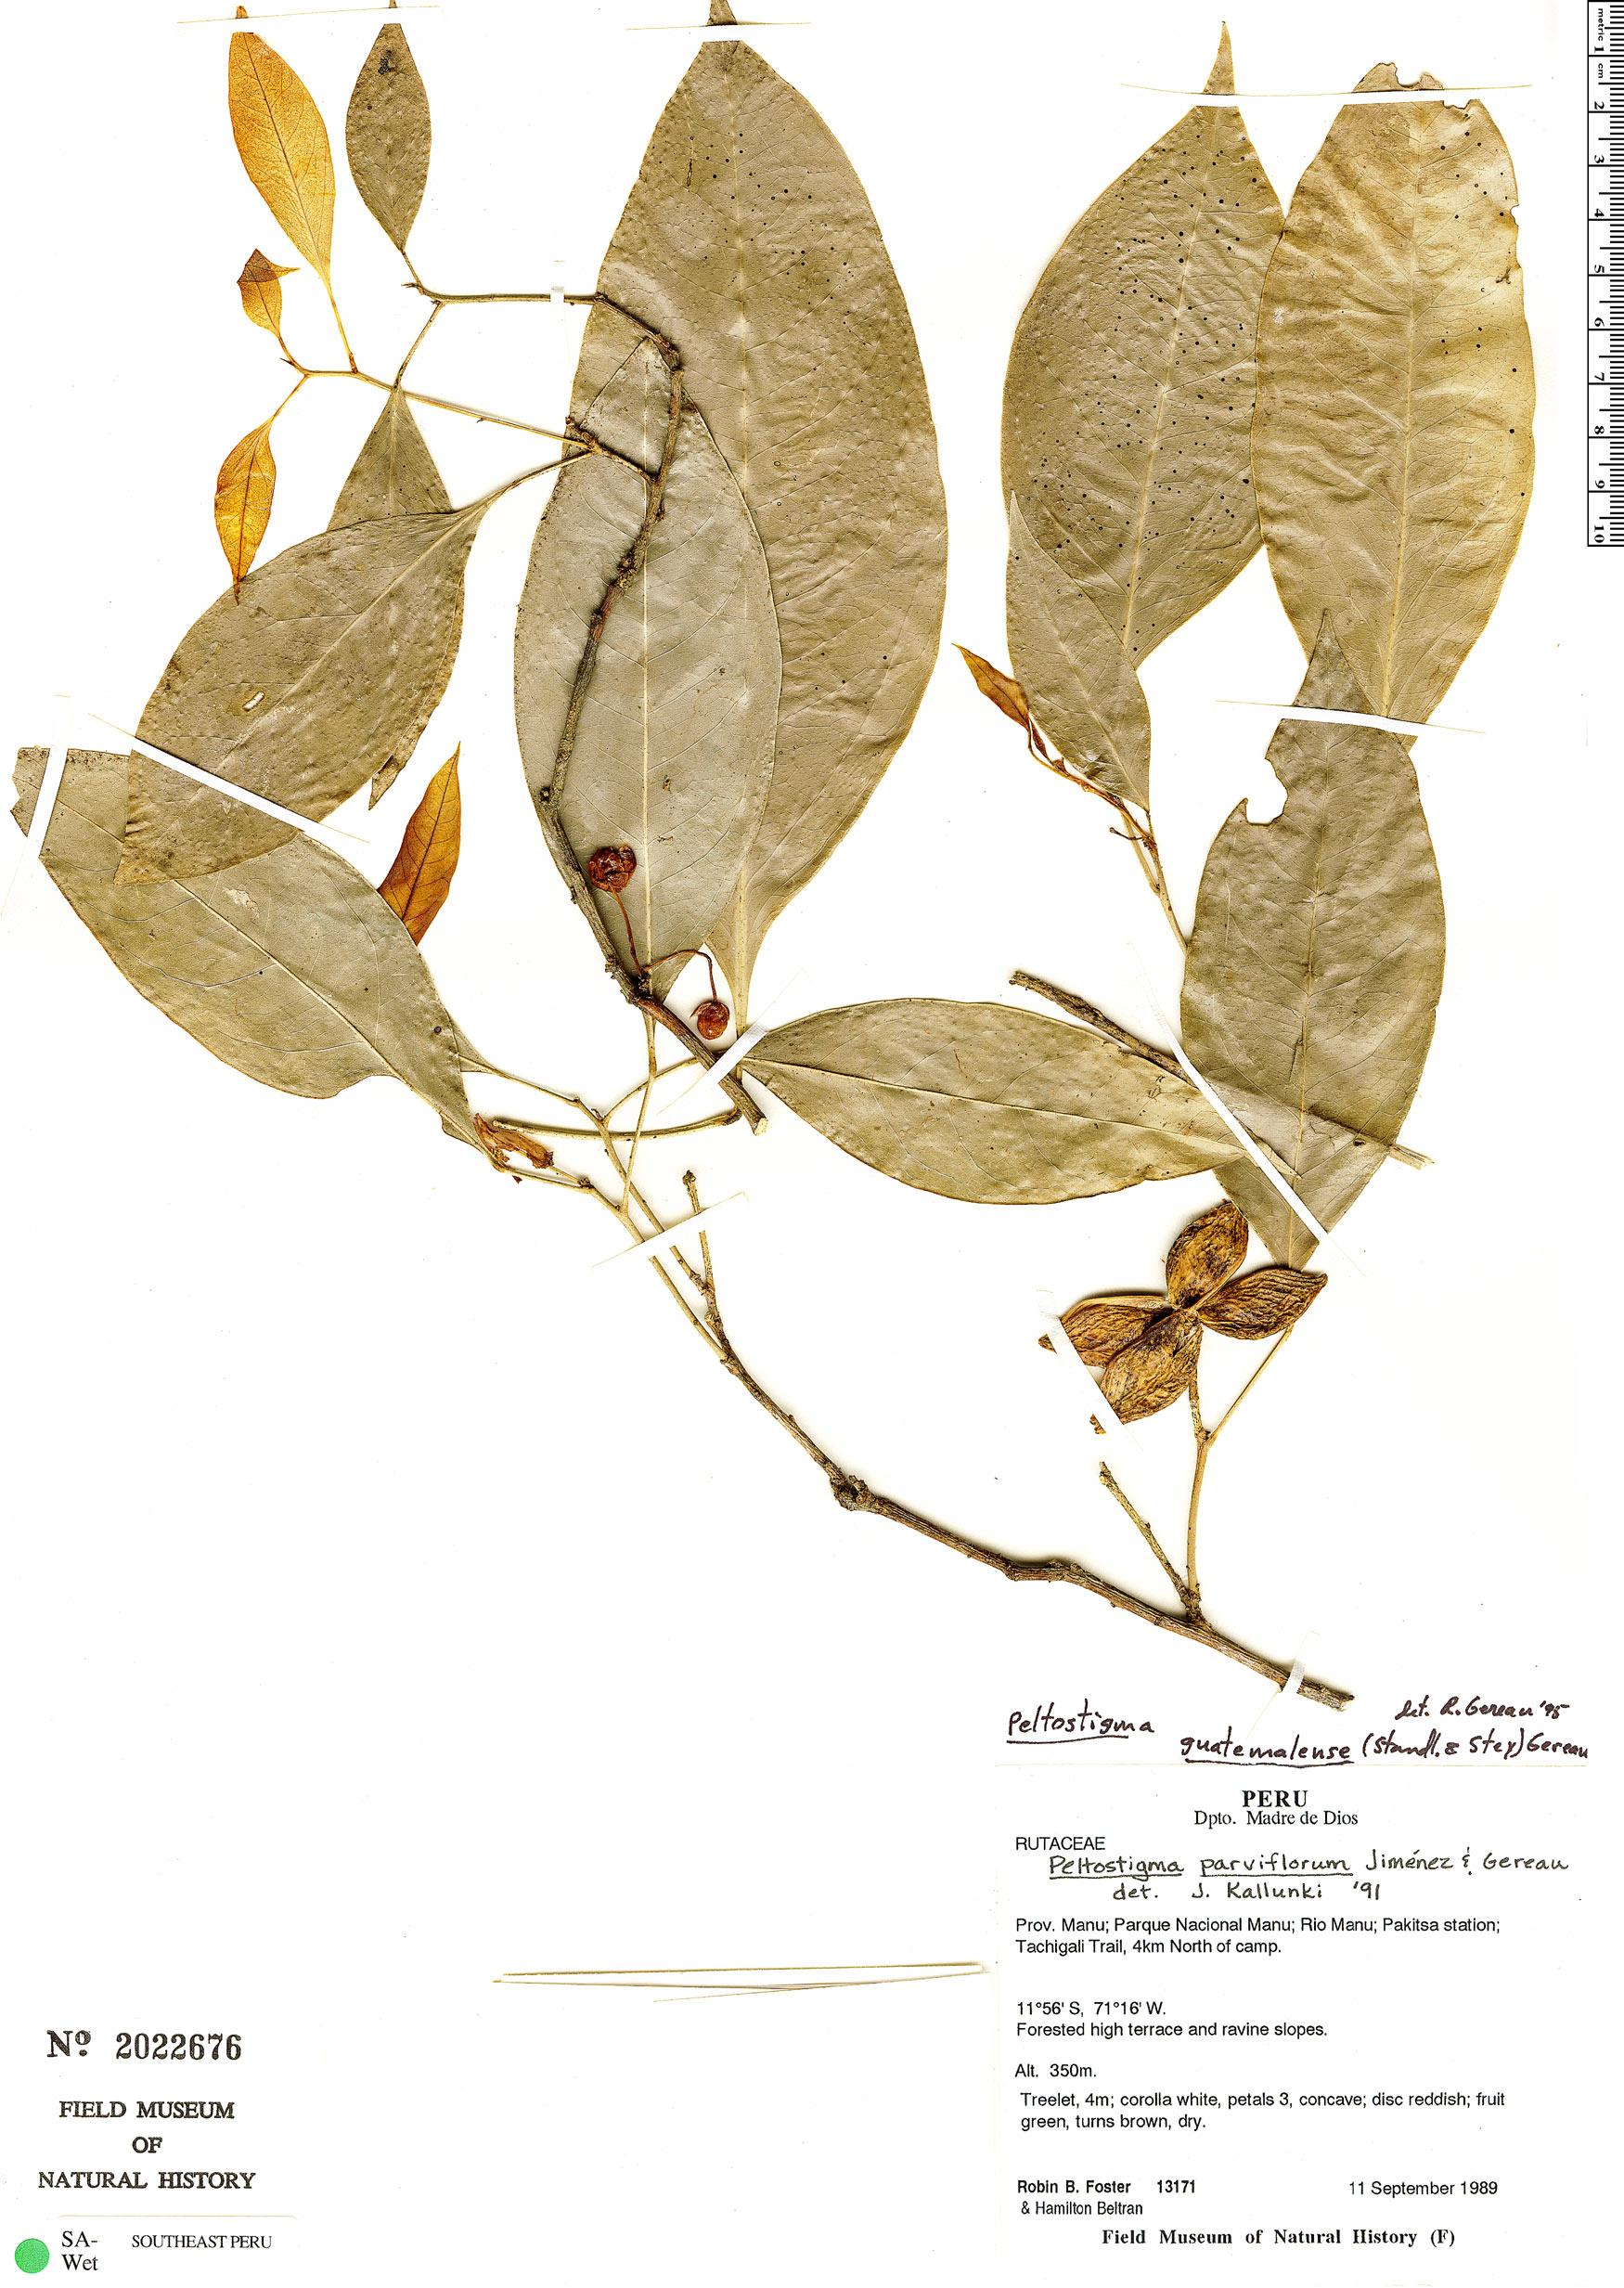 Espécime: Peltostigma guatemalense